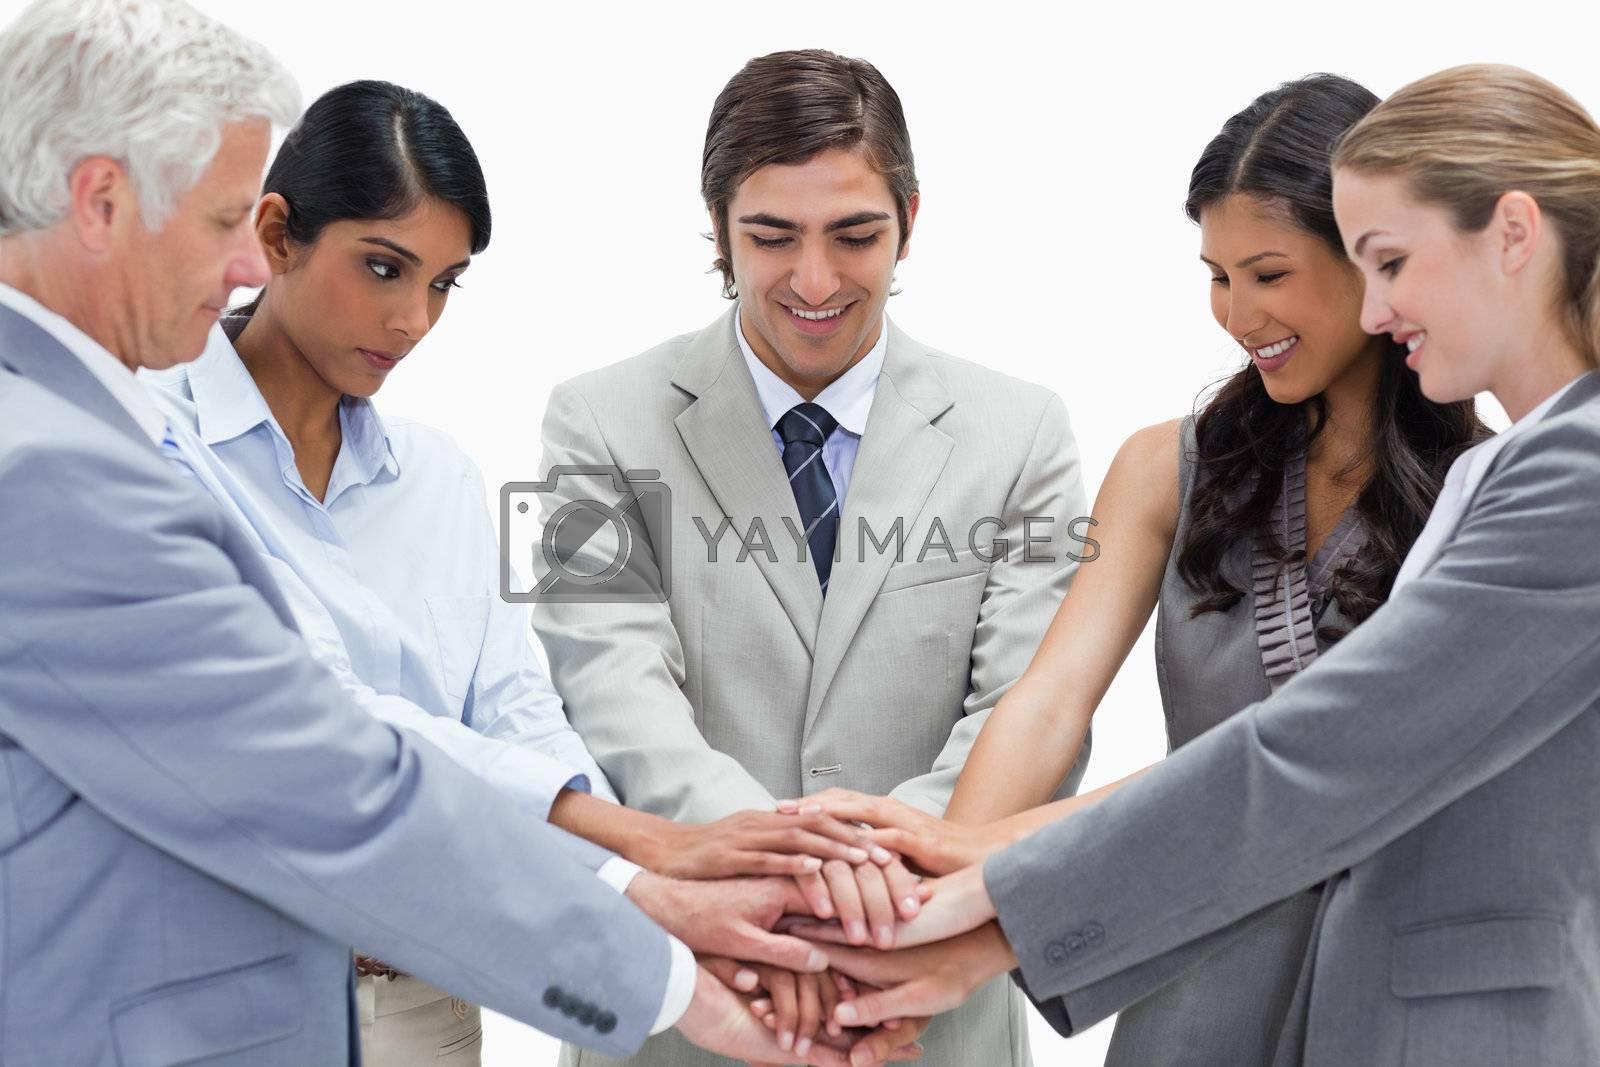 Successful teamwork against white background